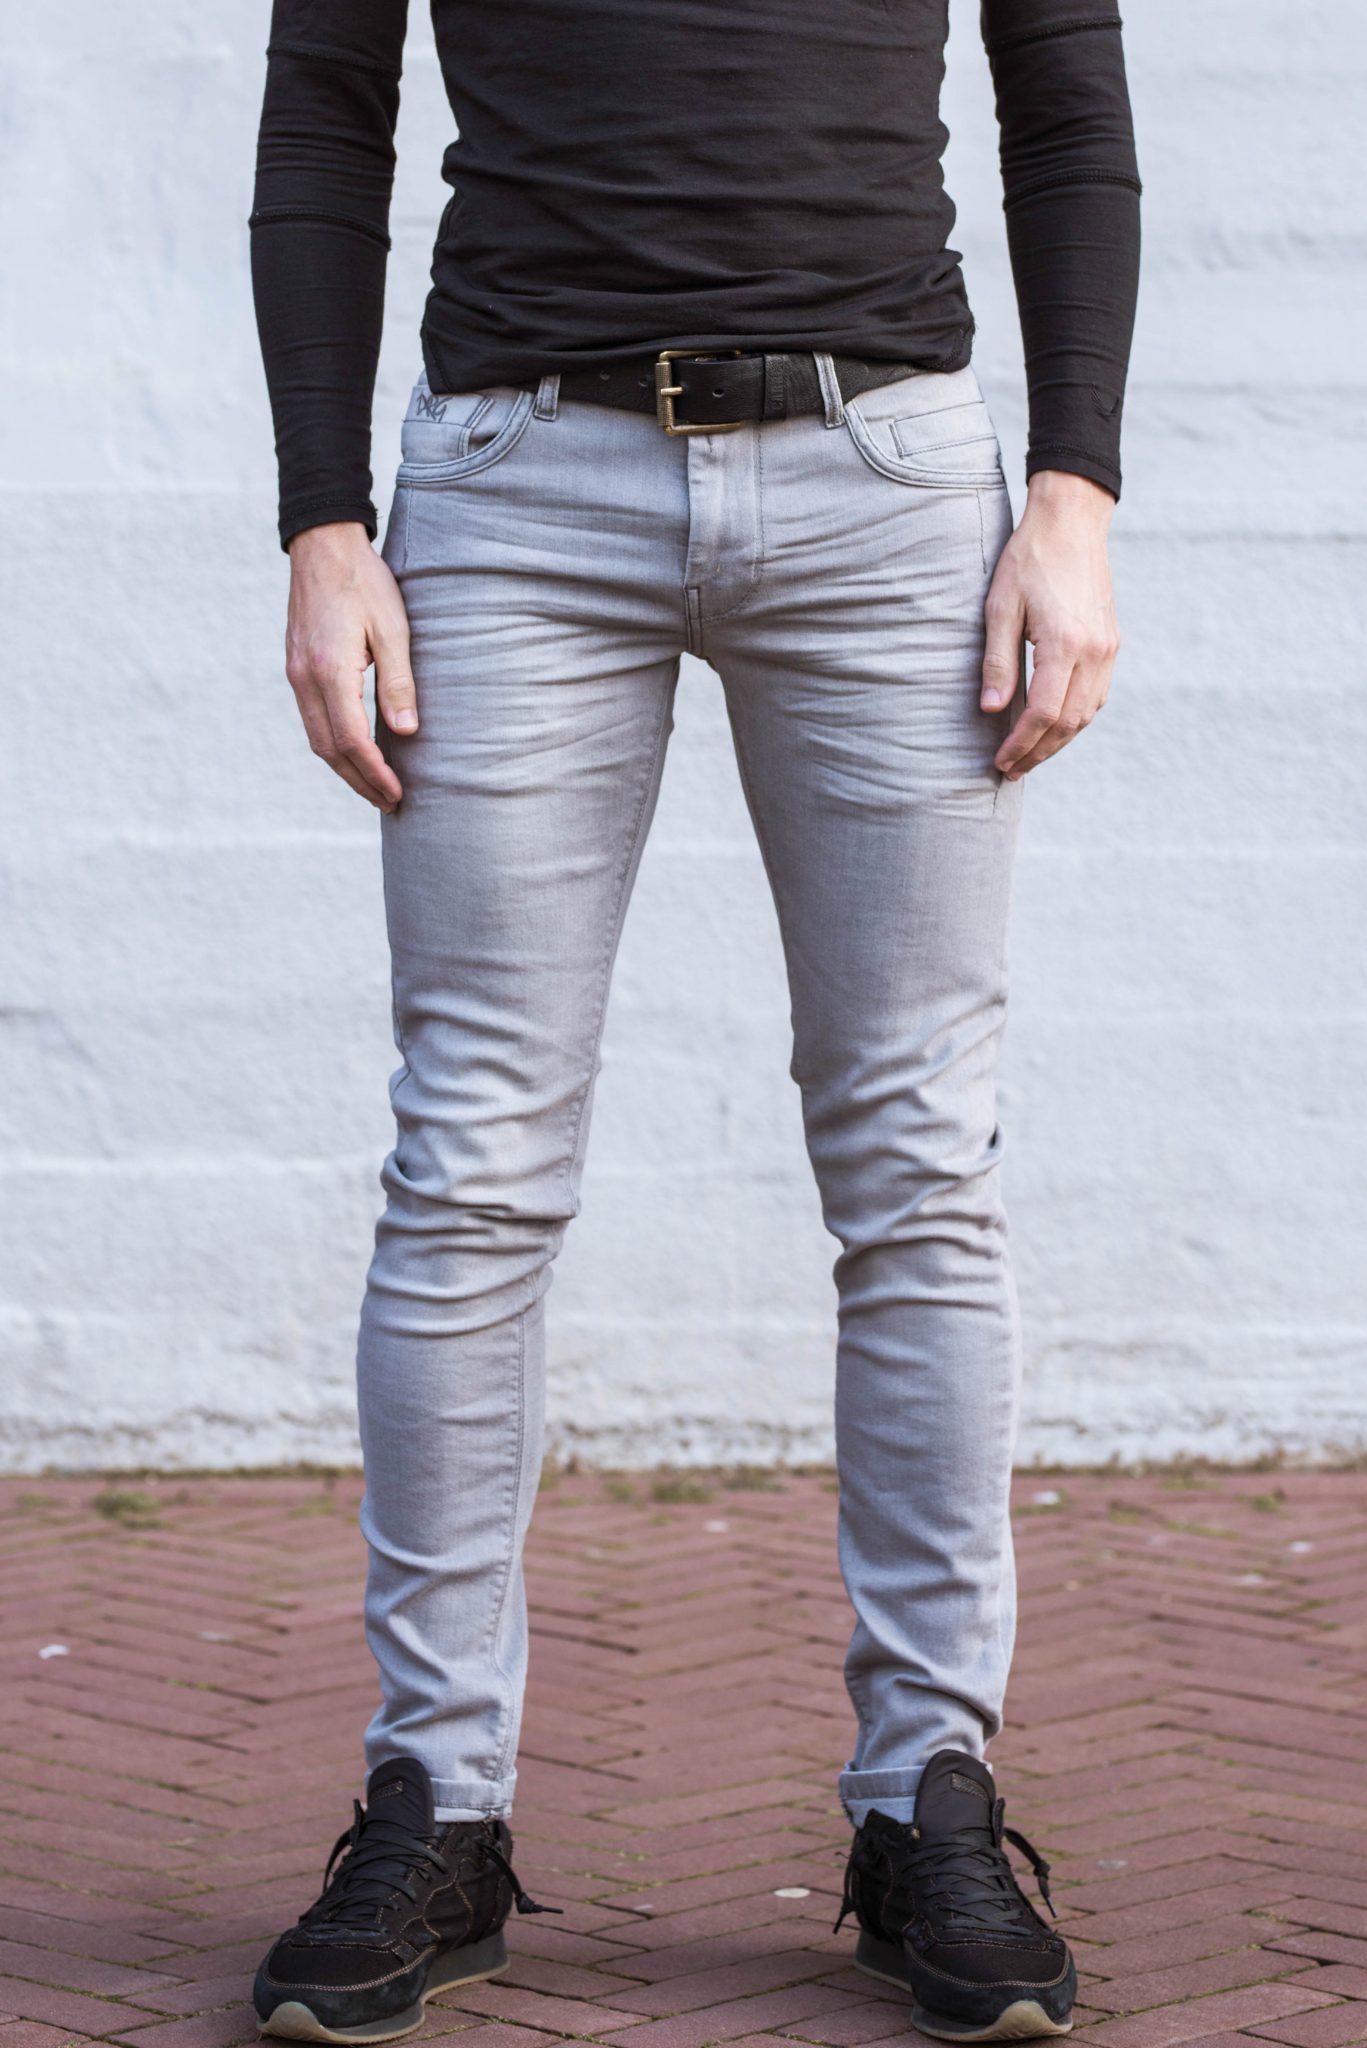 Betere Dragster Super Stretch Jeans Grijs, Lengte 36 !! - Jogg-jeans.nl PR-63